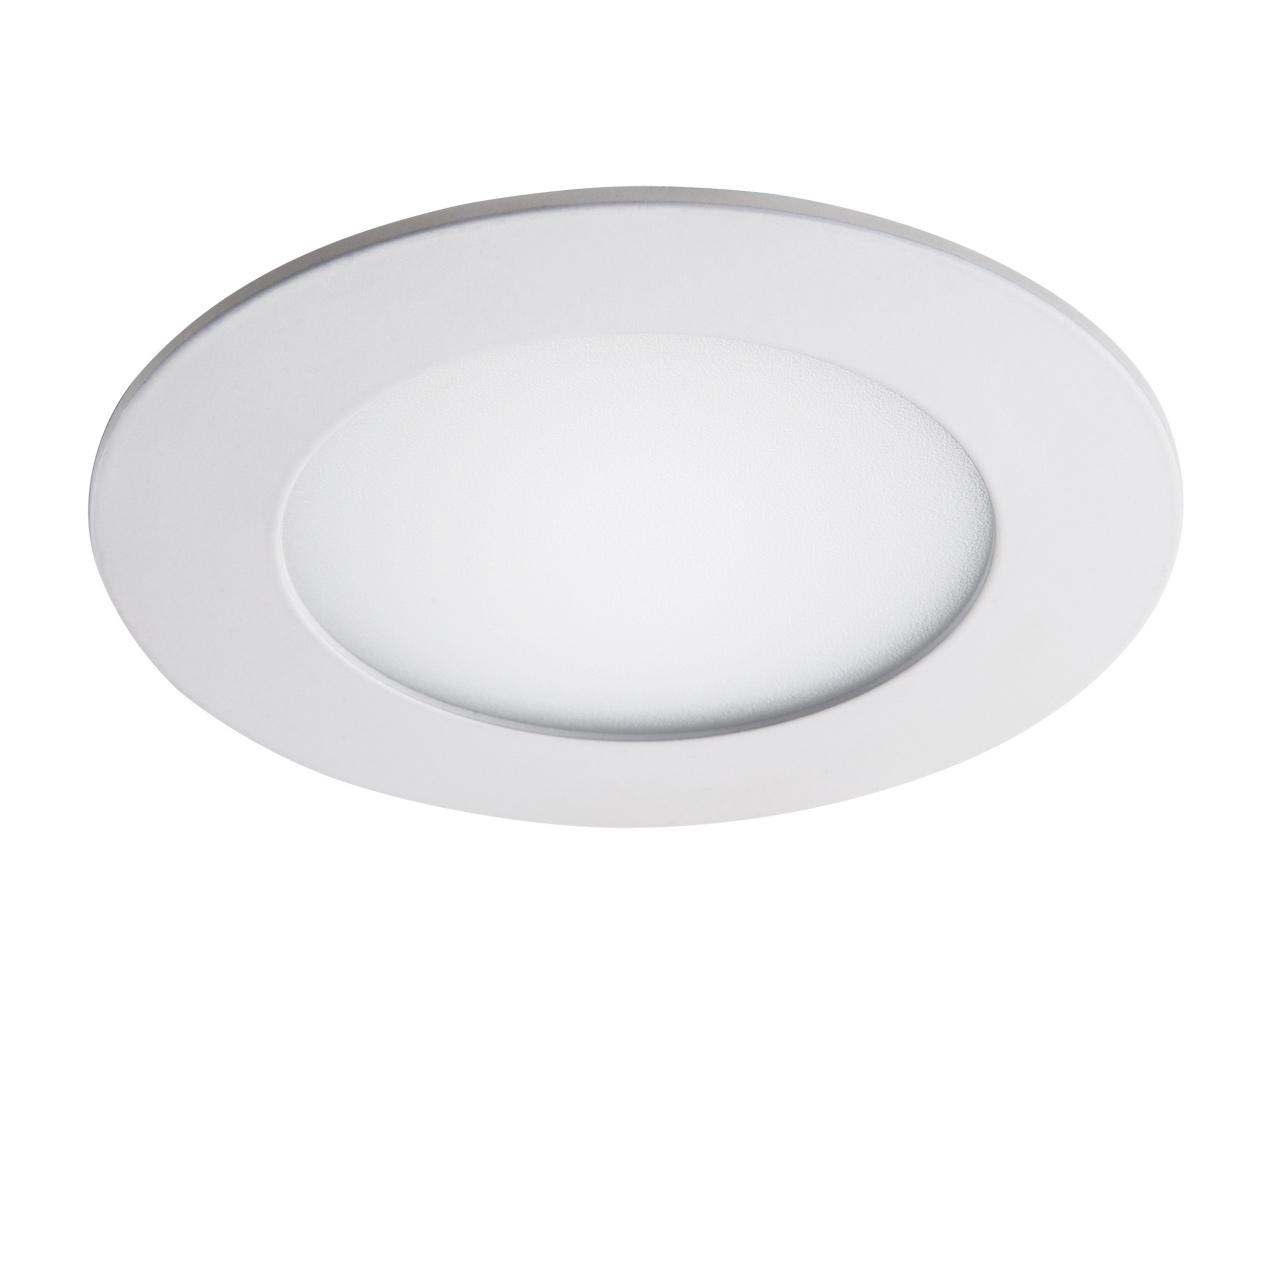 Светильник Zocco LED 6W 300LM 3000K Lightstar 223062